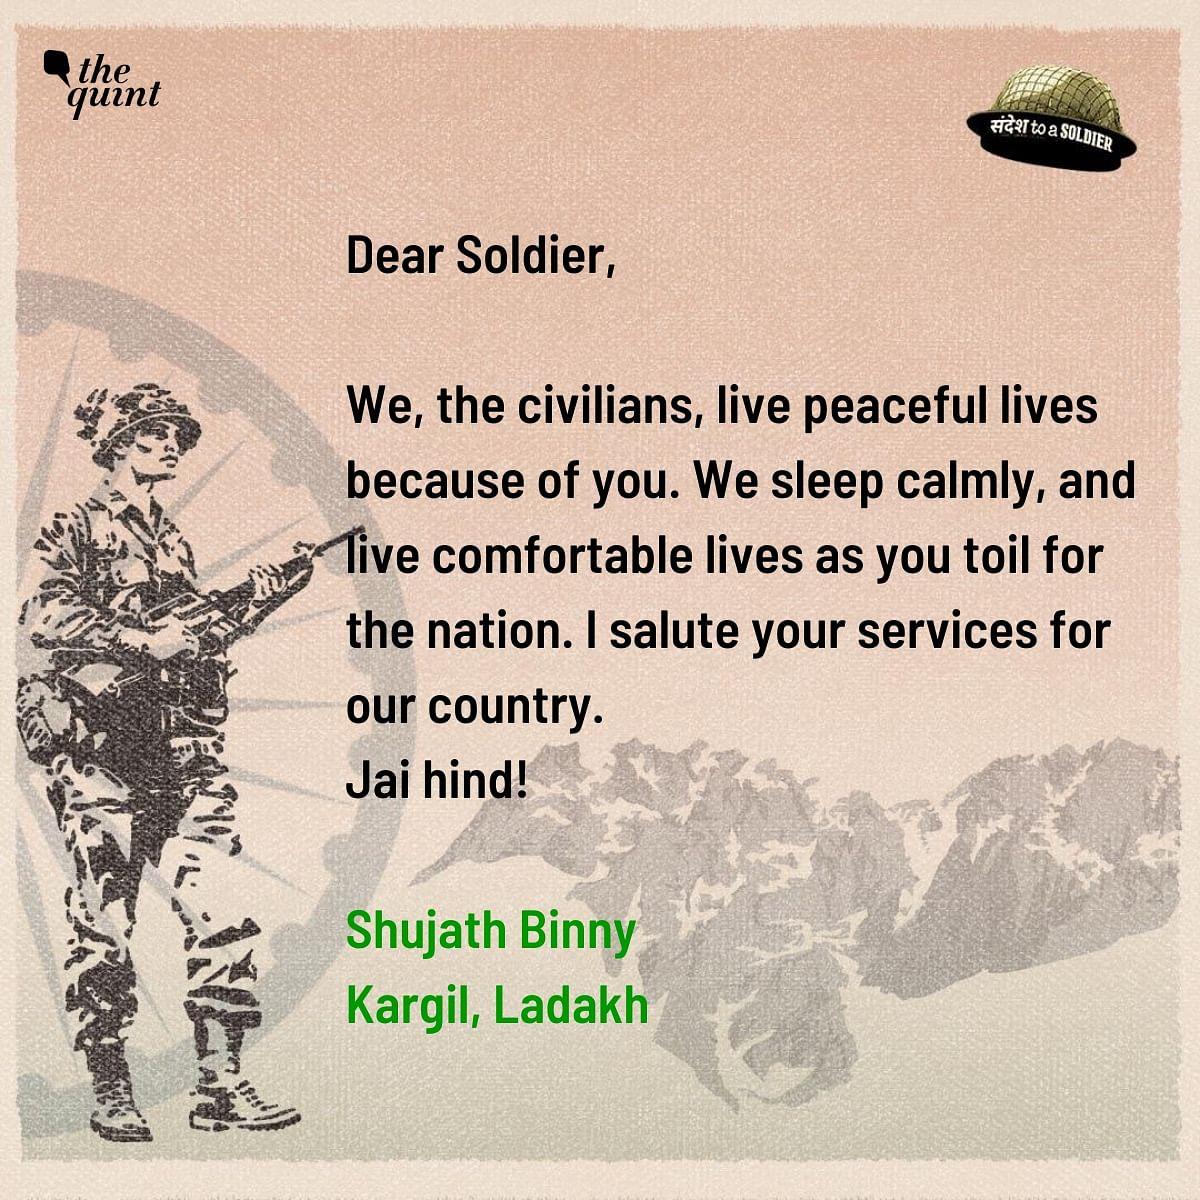 Shujhath Binny from Ladakh sends his sandesh to a soldier.